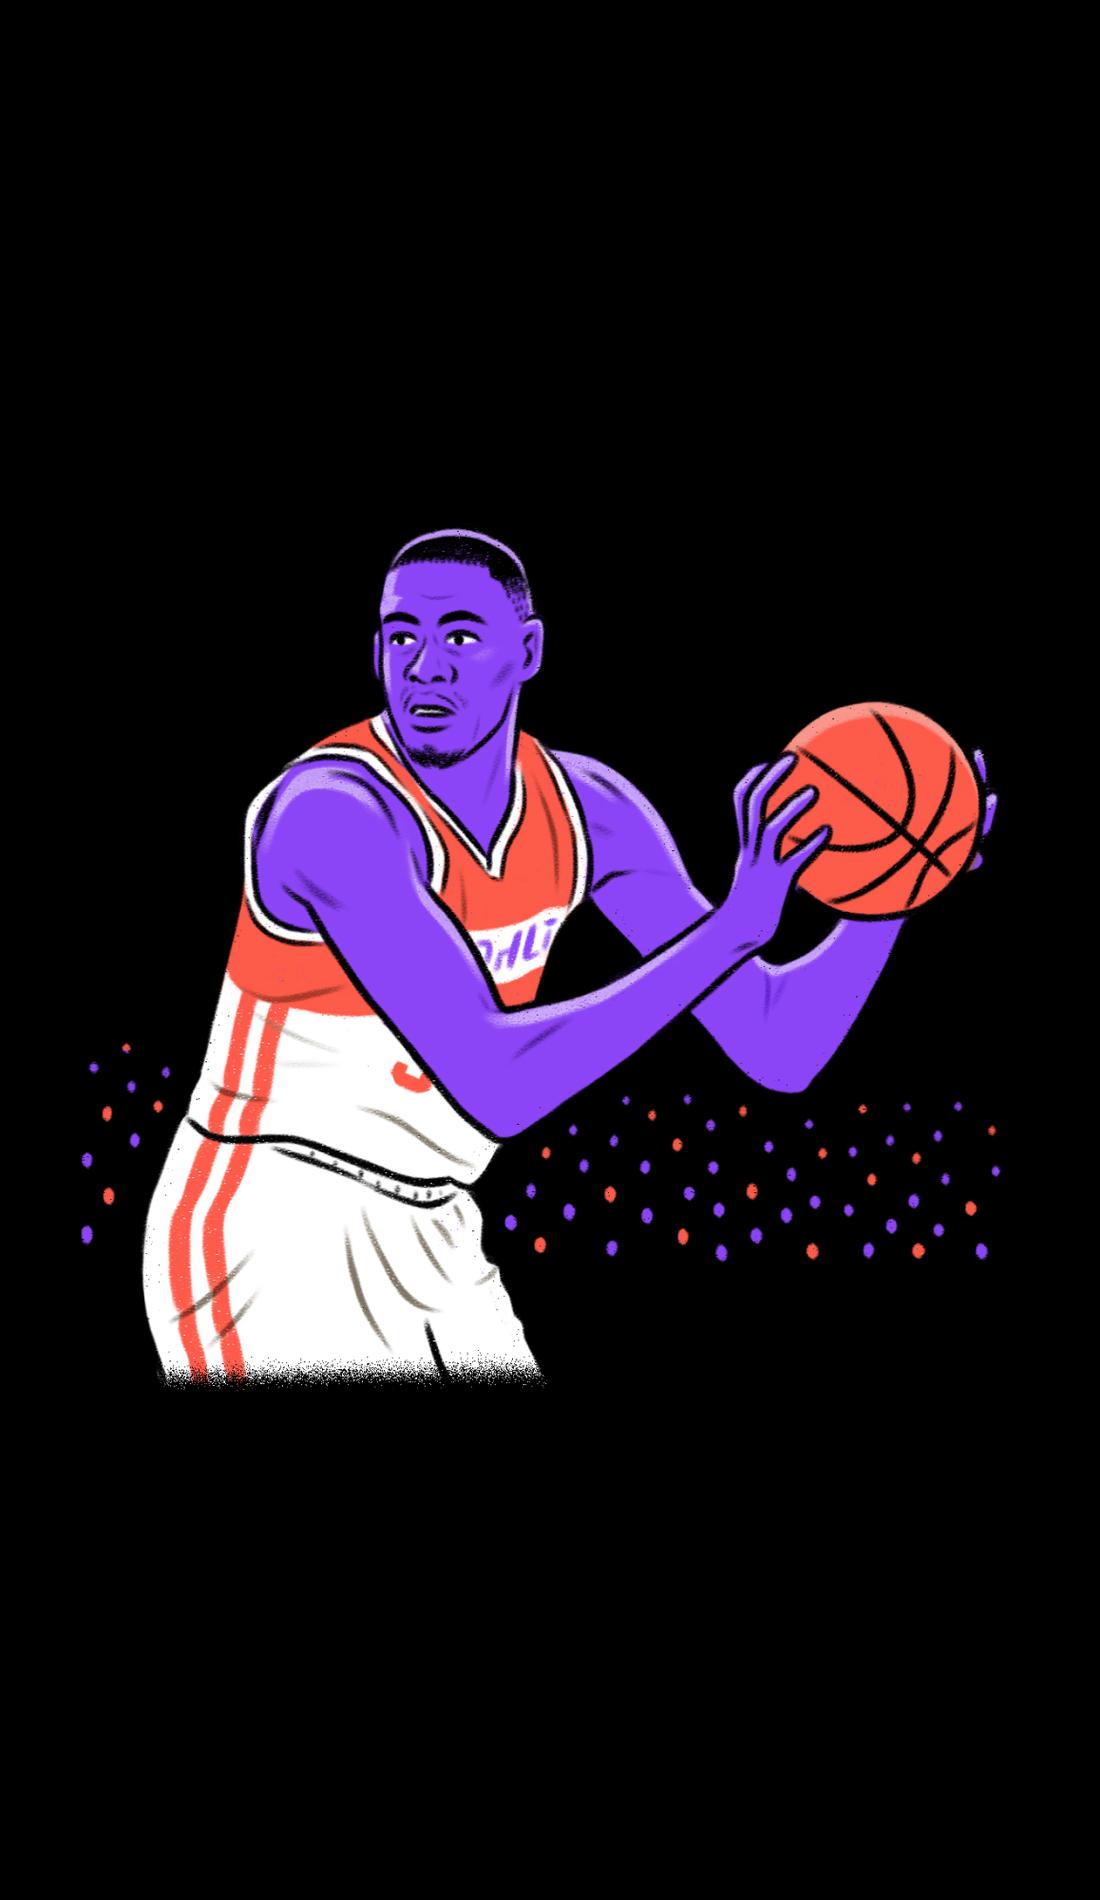 A Mizzou Tigers Men's Basketball live event